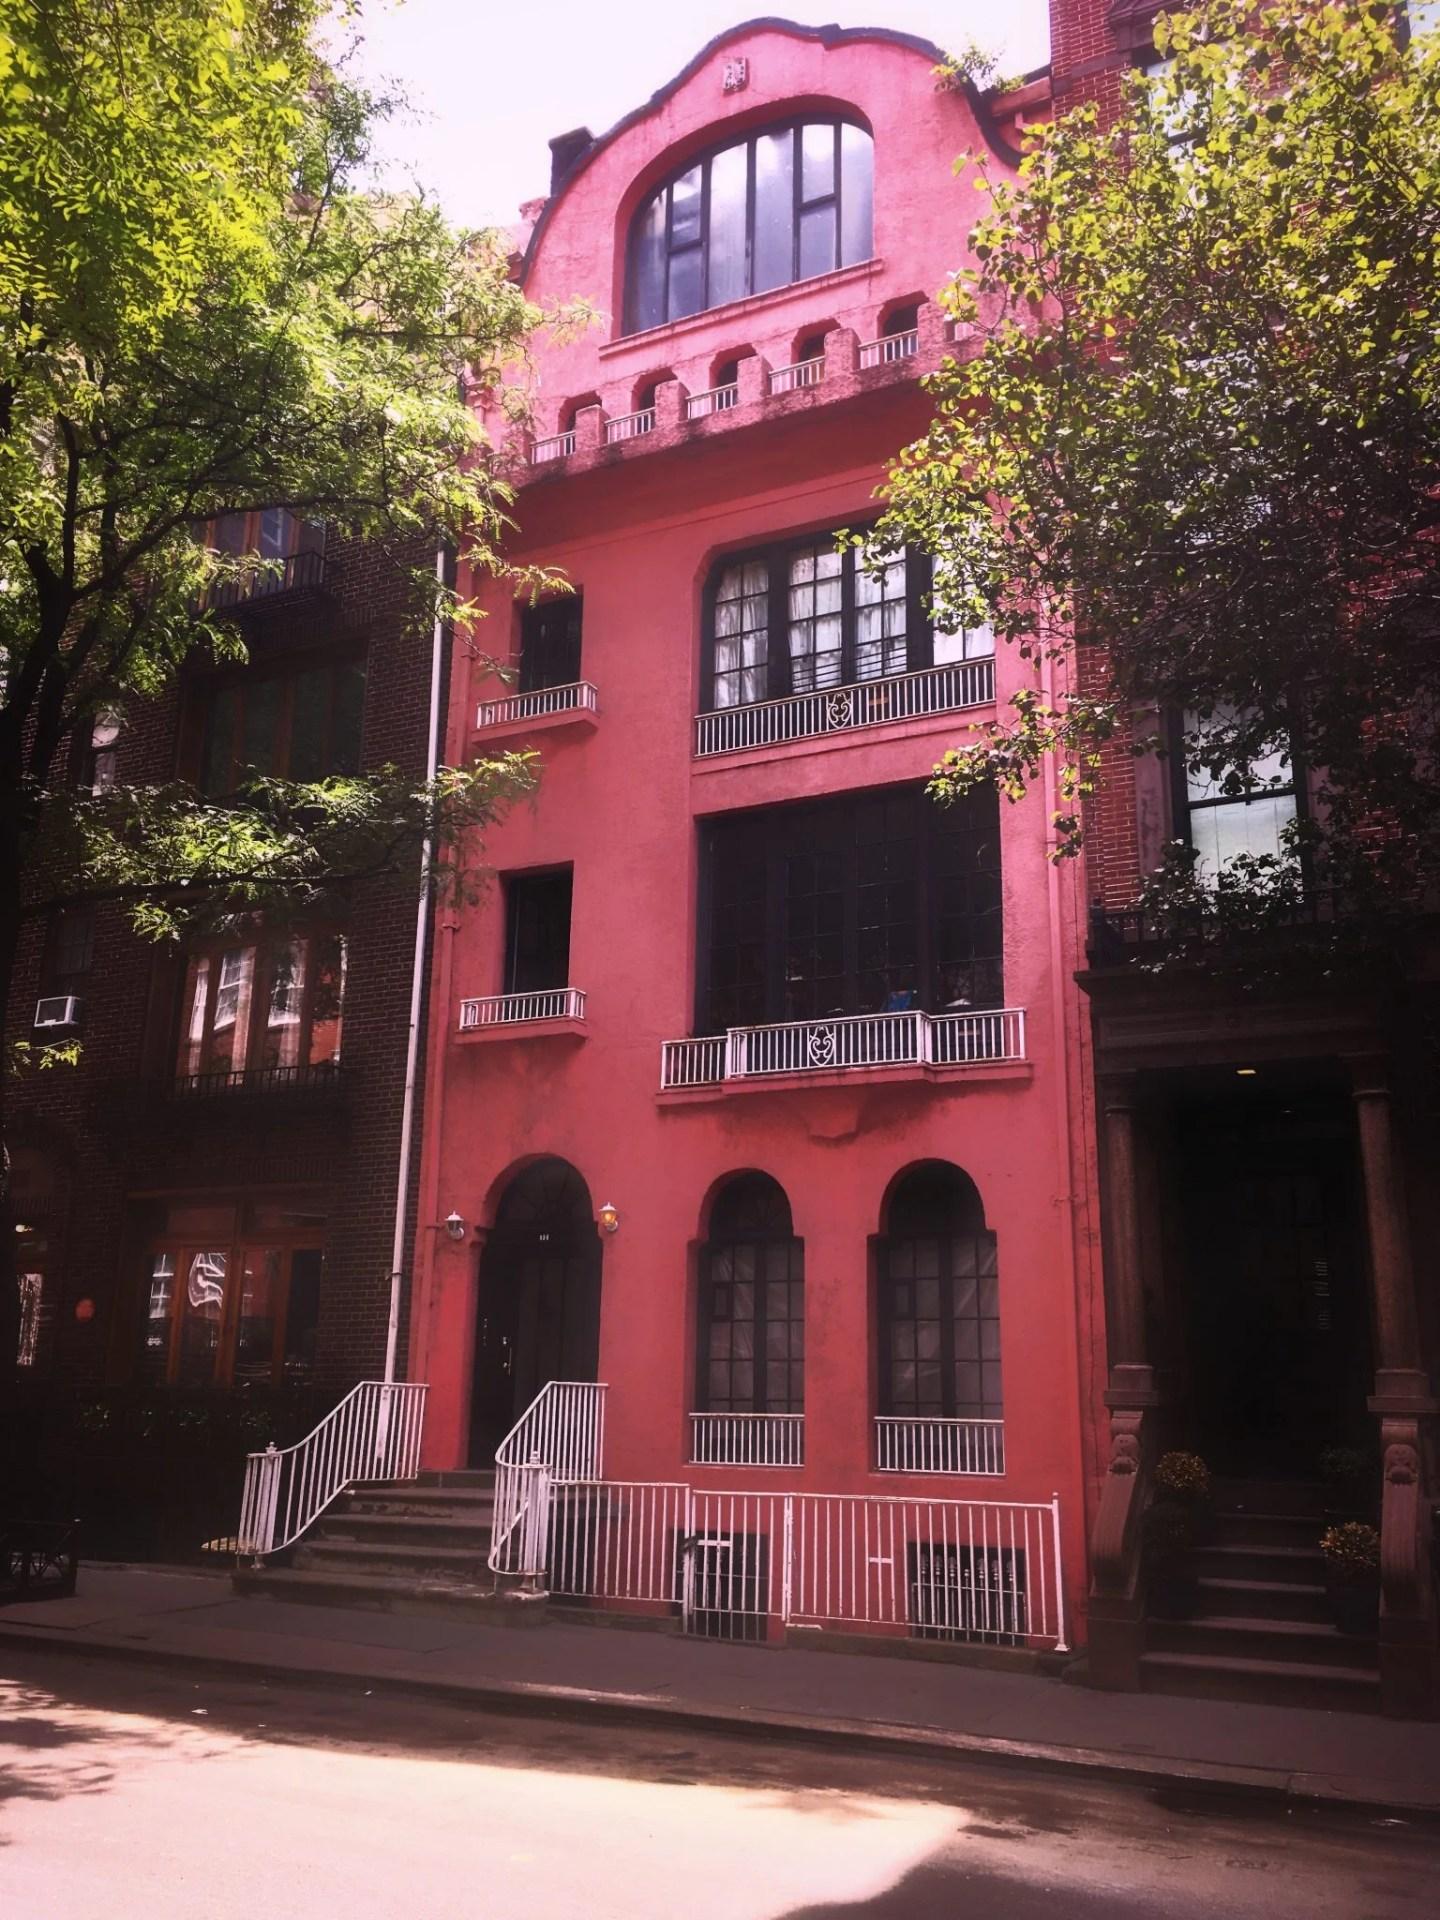 NYC Tour, Book Review, Annie Van tour